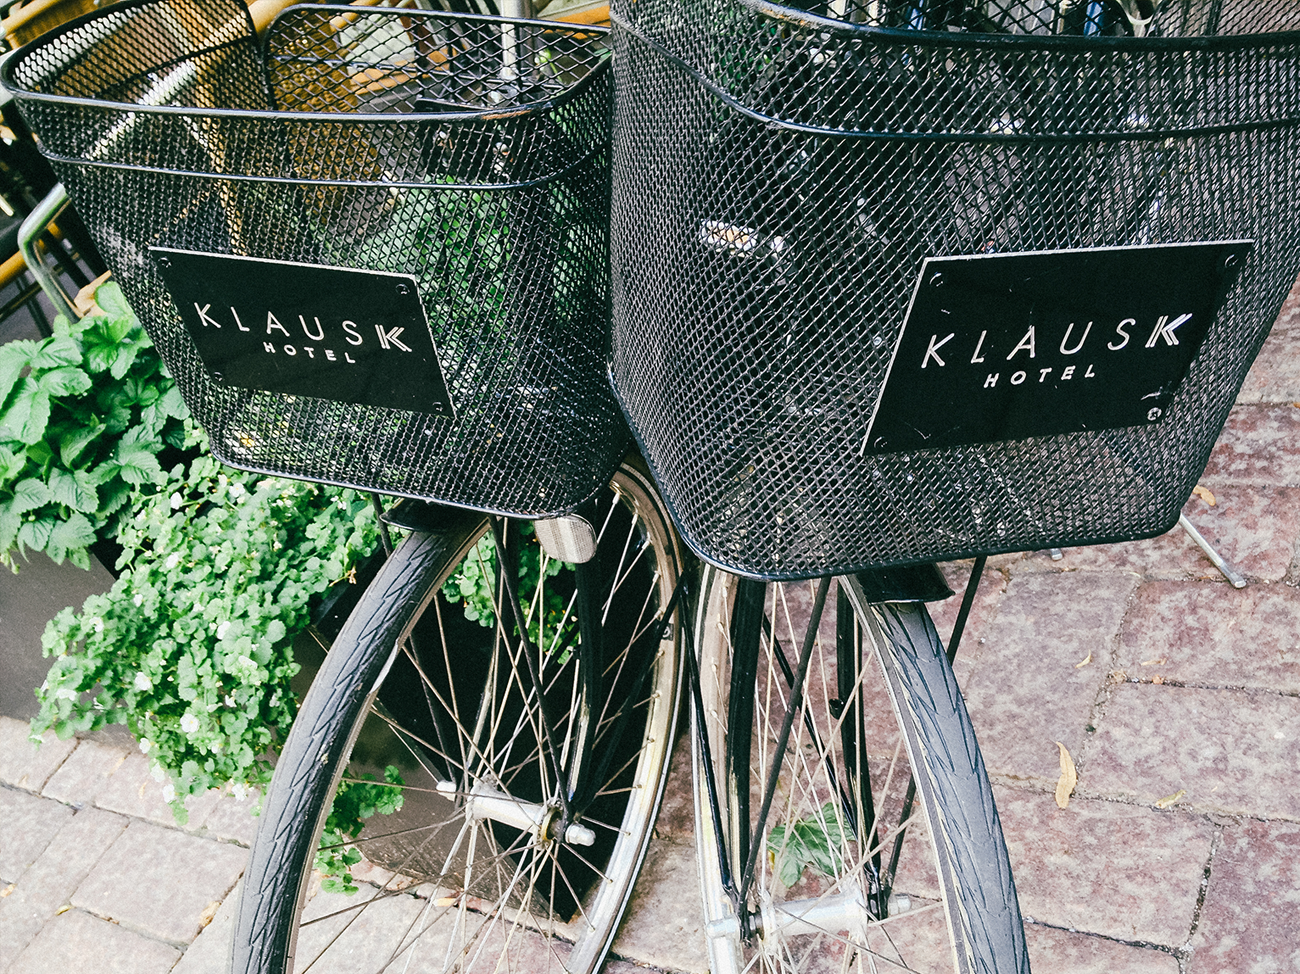 Klaus K Design Hotel Helsinki